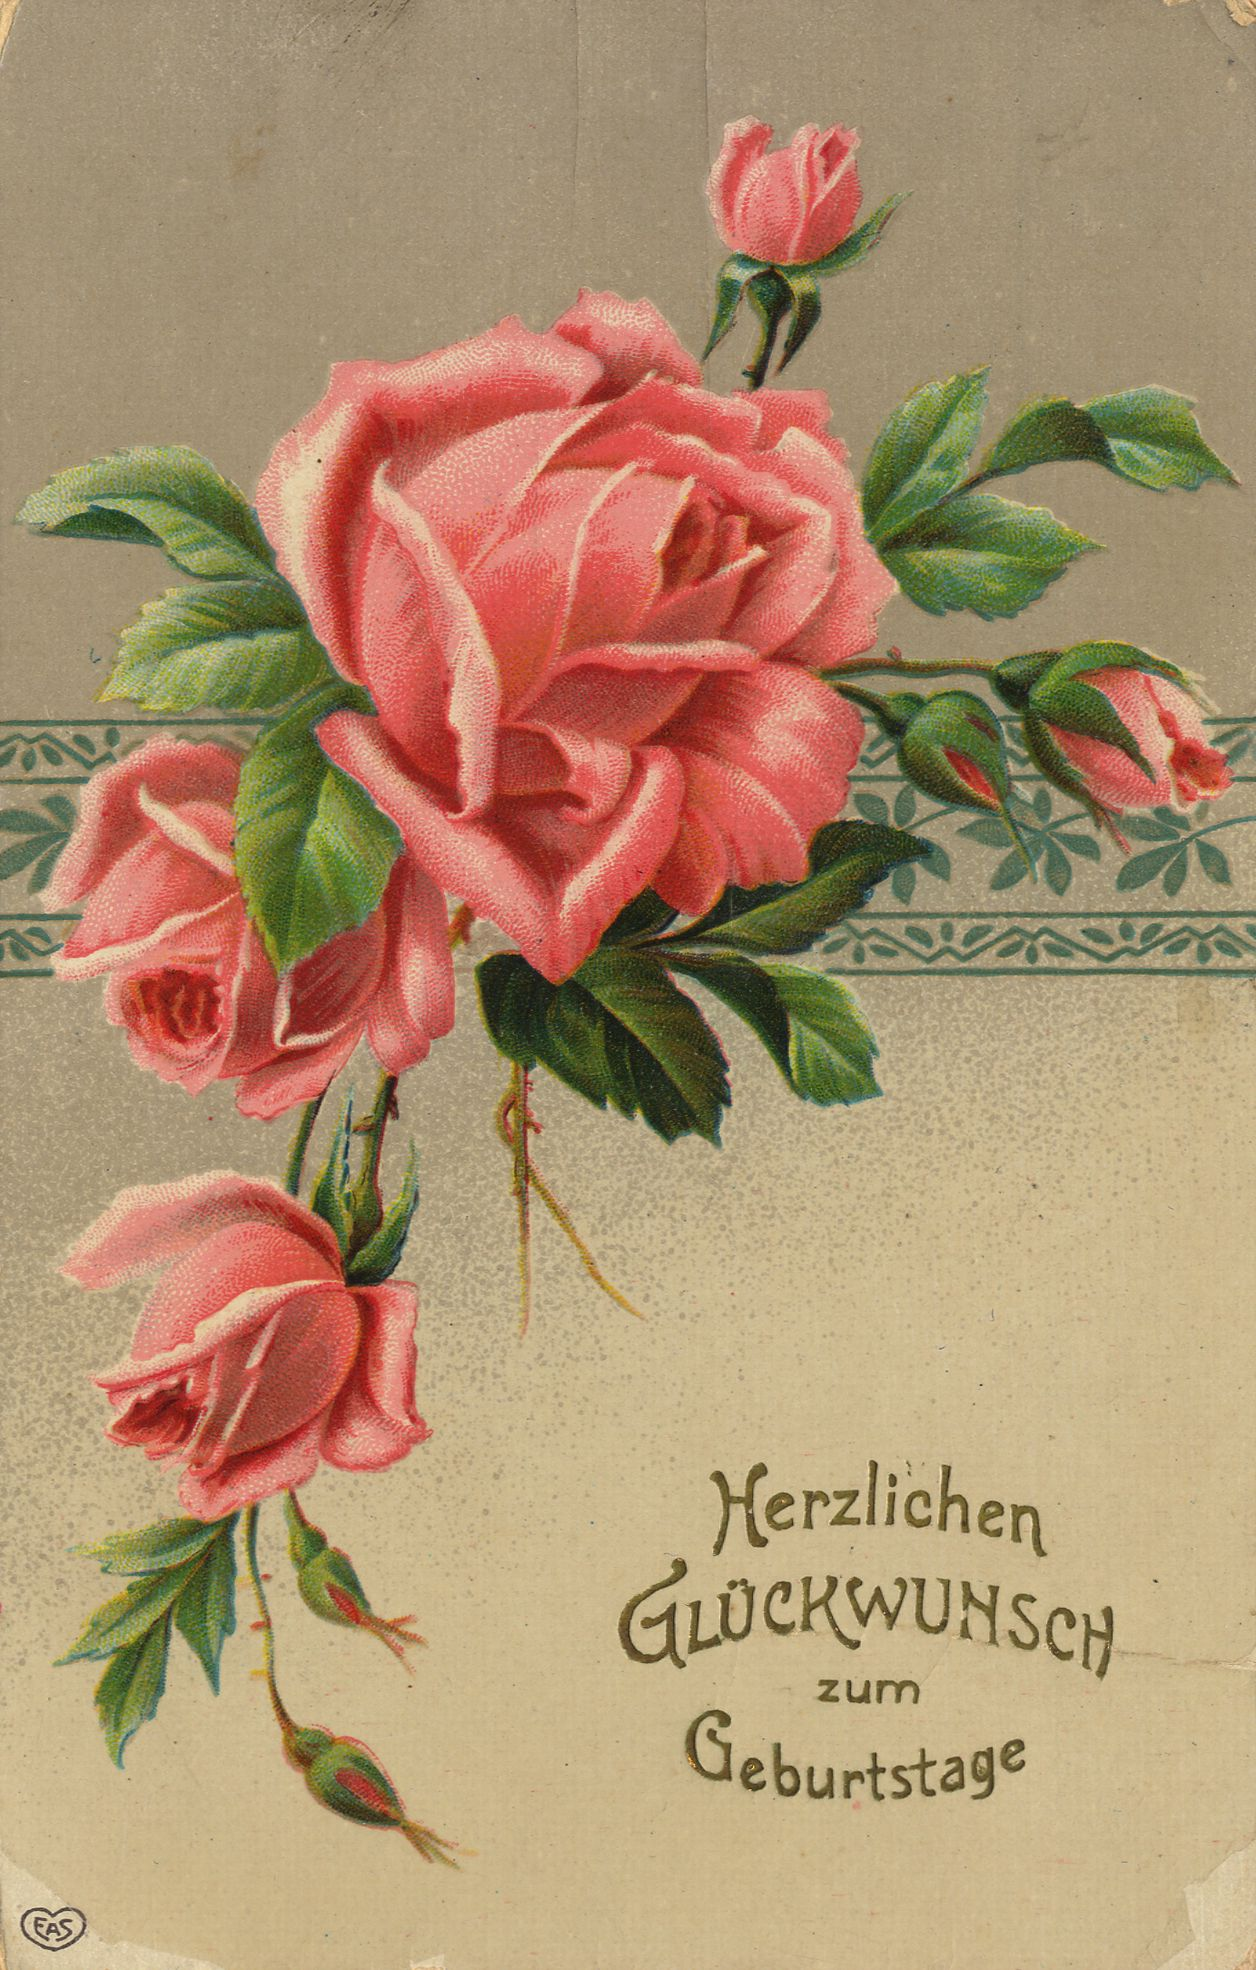 Geburtstag Blumen 2 Rosen 7 Zeno Org